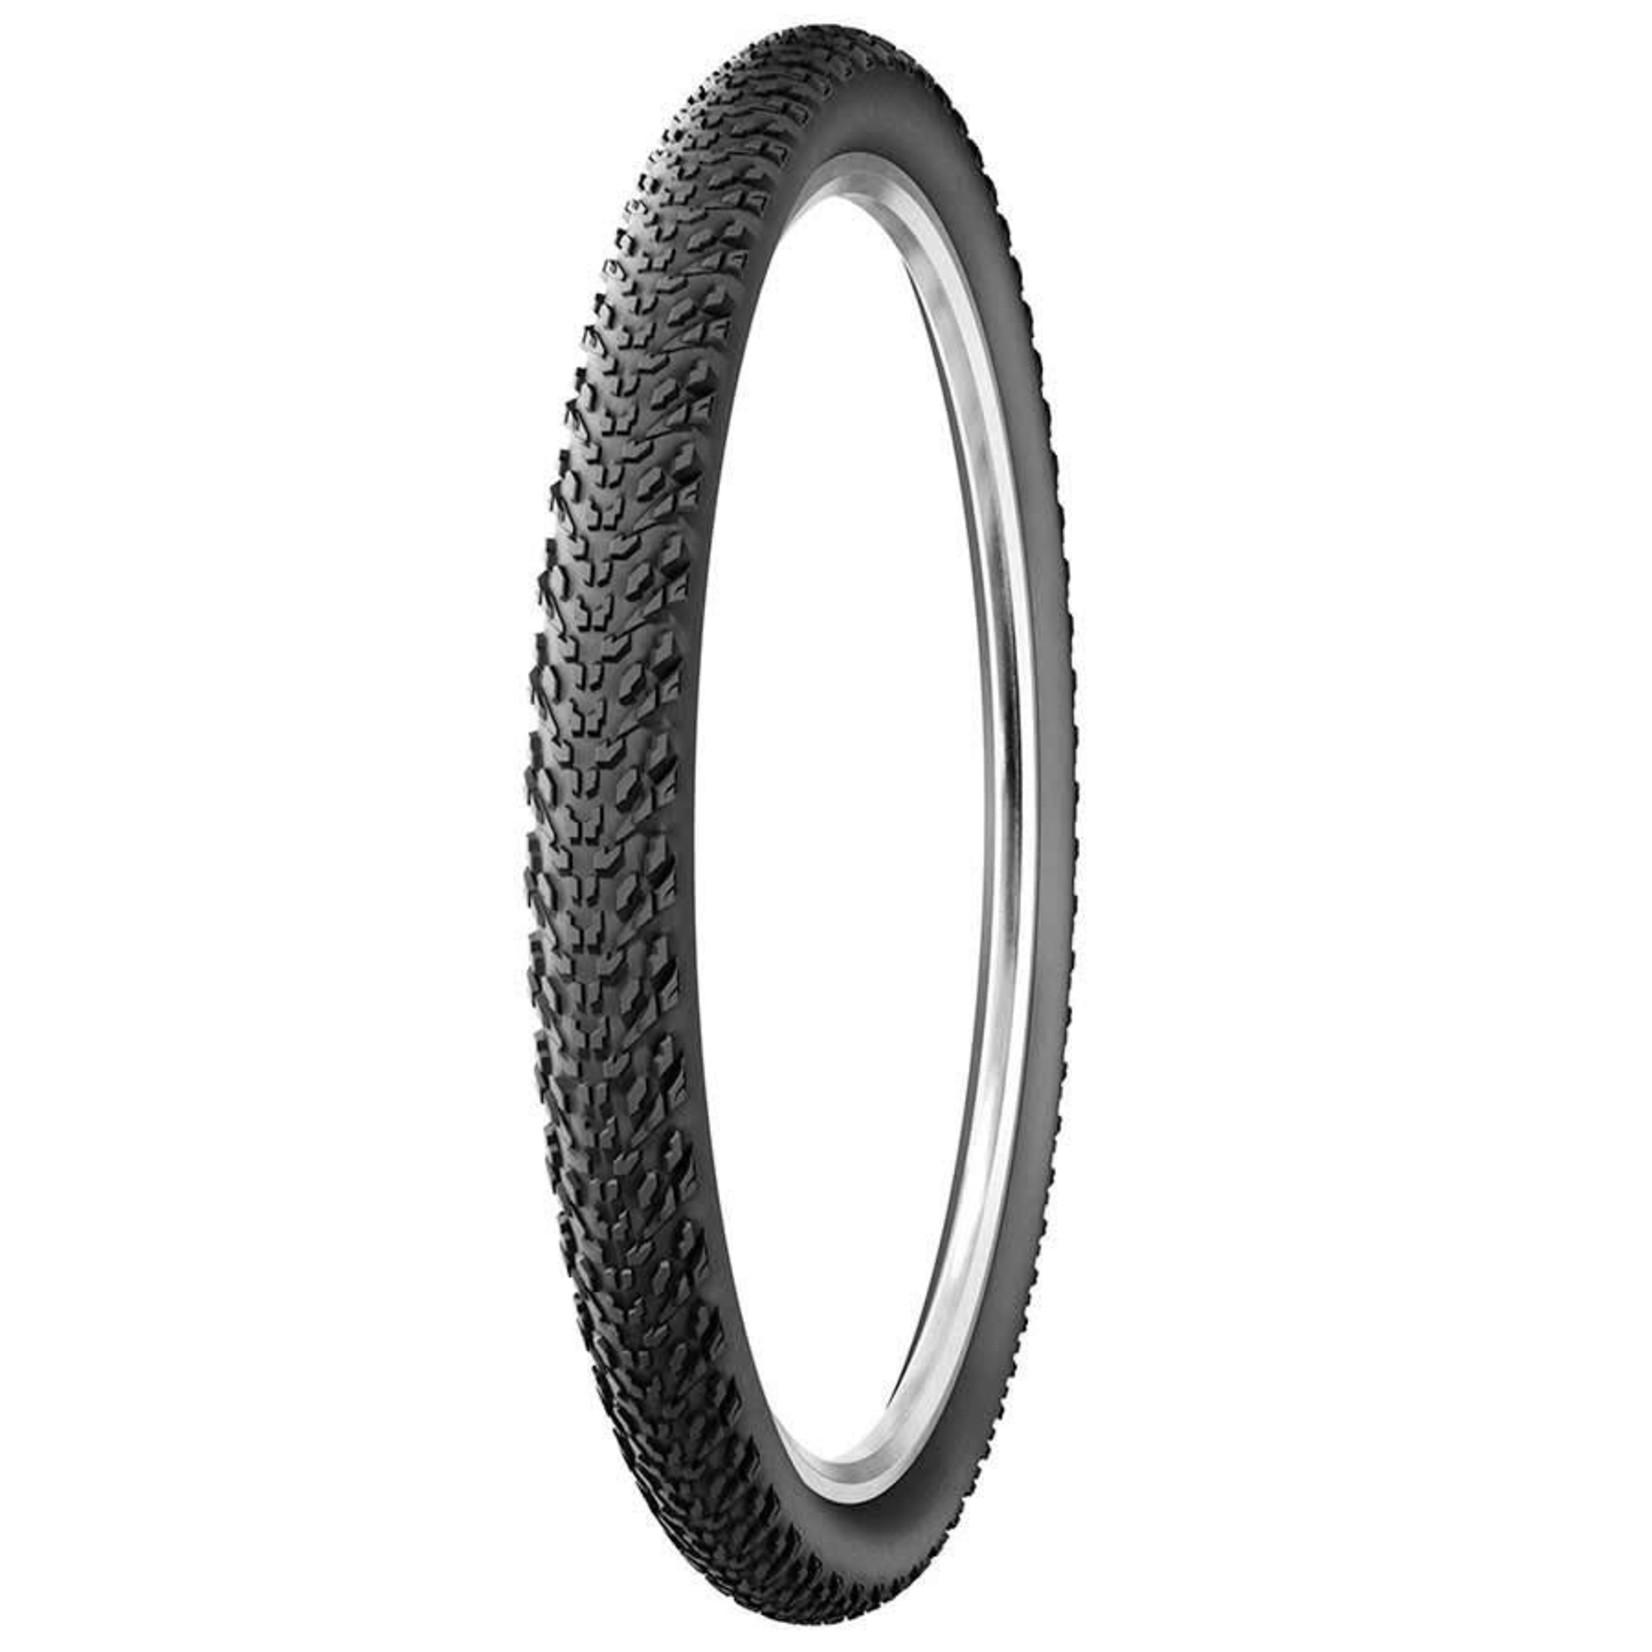 Michelin Country Dry 2, 26x2.00, Rigide, 33TPI, 29-58PSI, 600g, Noir